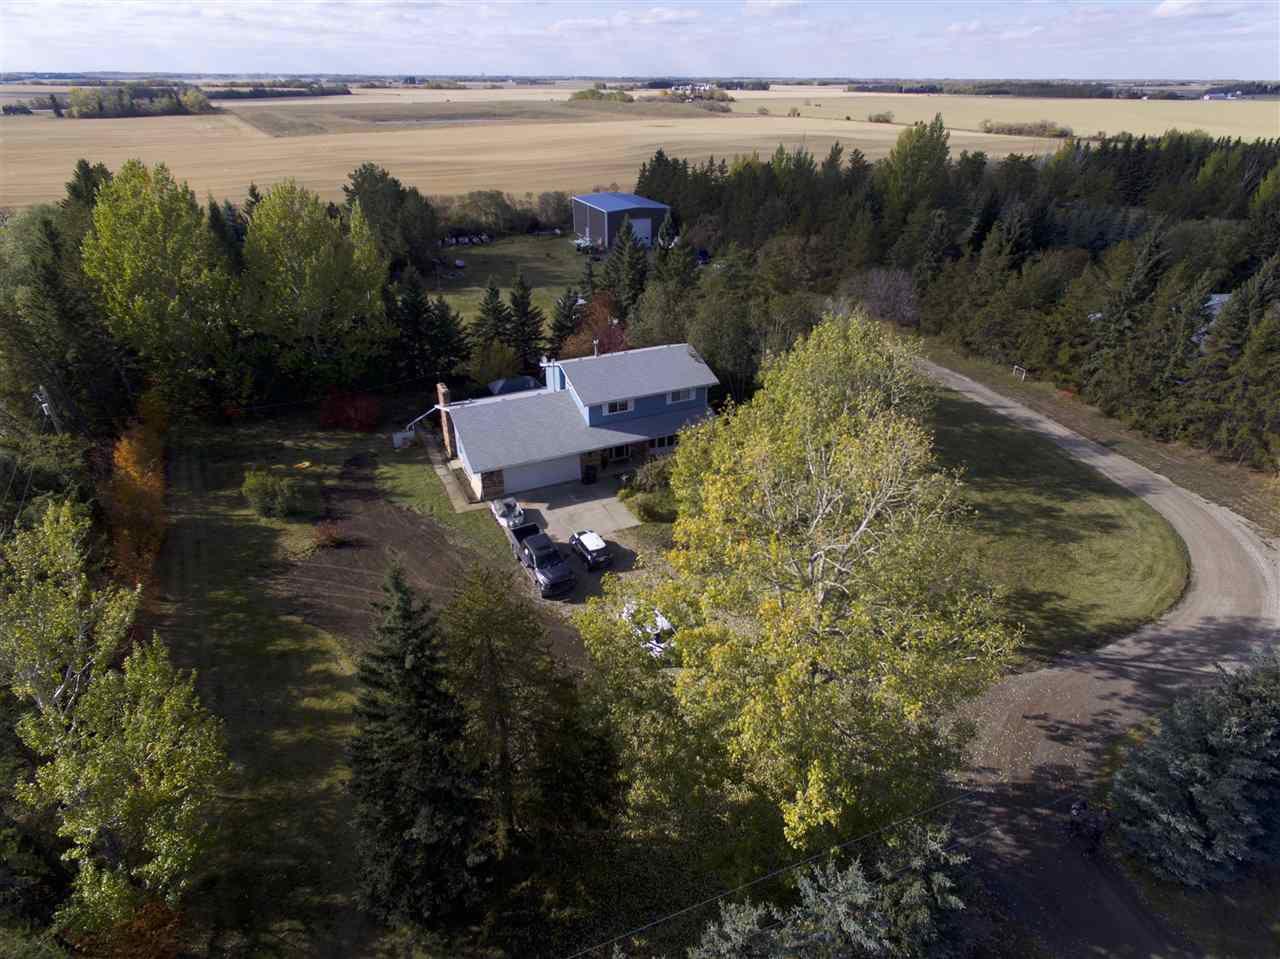 Main Photo: 29 SHULTZ Drive: Rural Sturgeon County House for sale : MLS®# E4146942